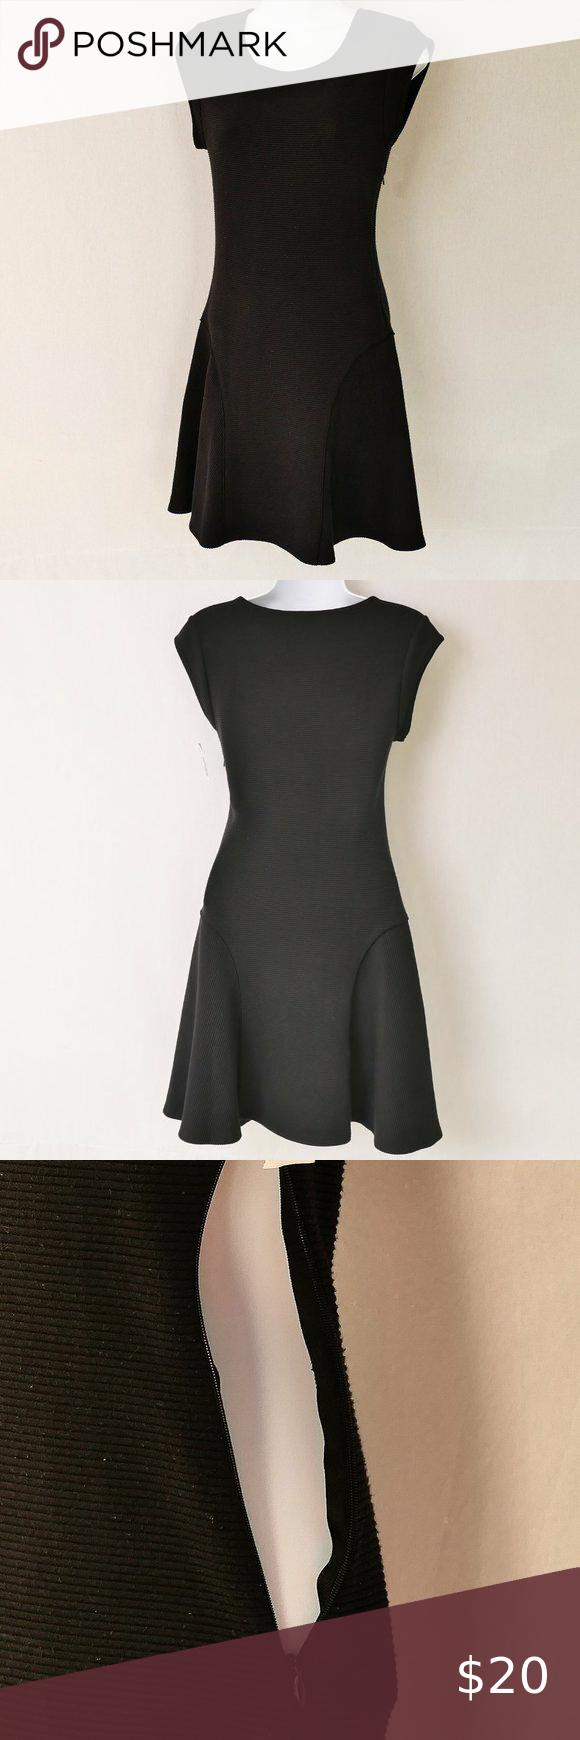 Victoria S Secret Black Dress Victoria S Secret Black Dress Bra Tops Style With Built In Cami Style Bra No Cup Clothes Design Black Dress Victoria Secret [ 1740 x 580 Pixel ]